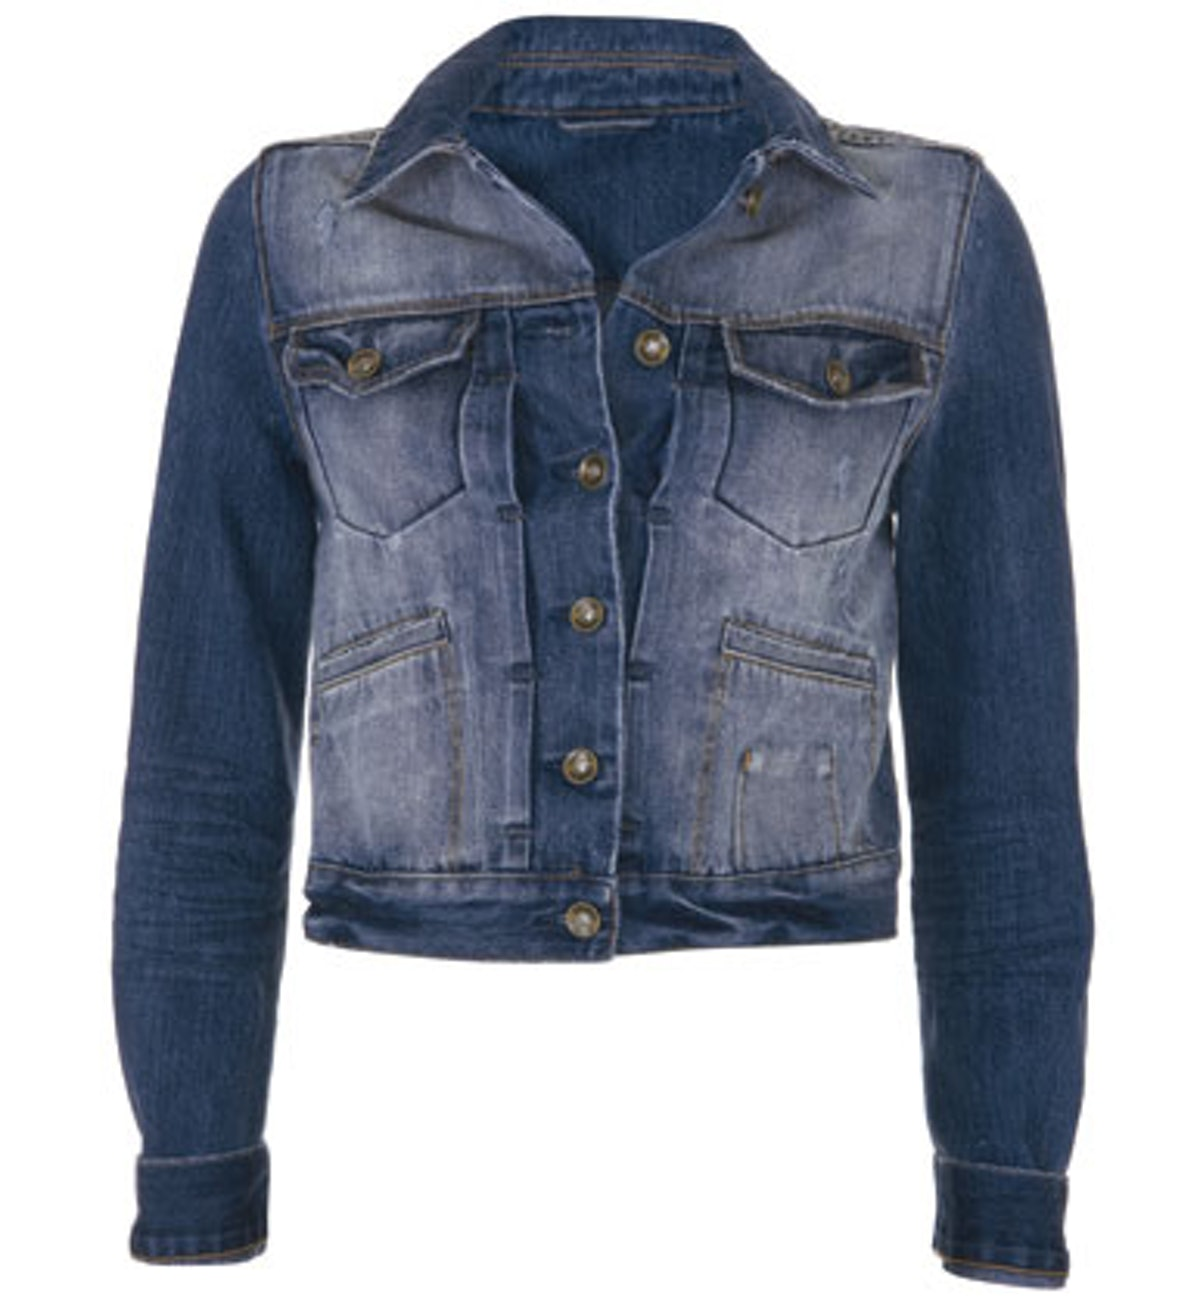 blog_topshop_jeans_01.jpg